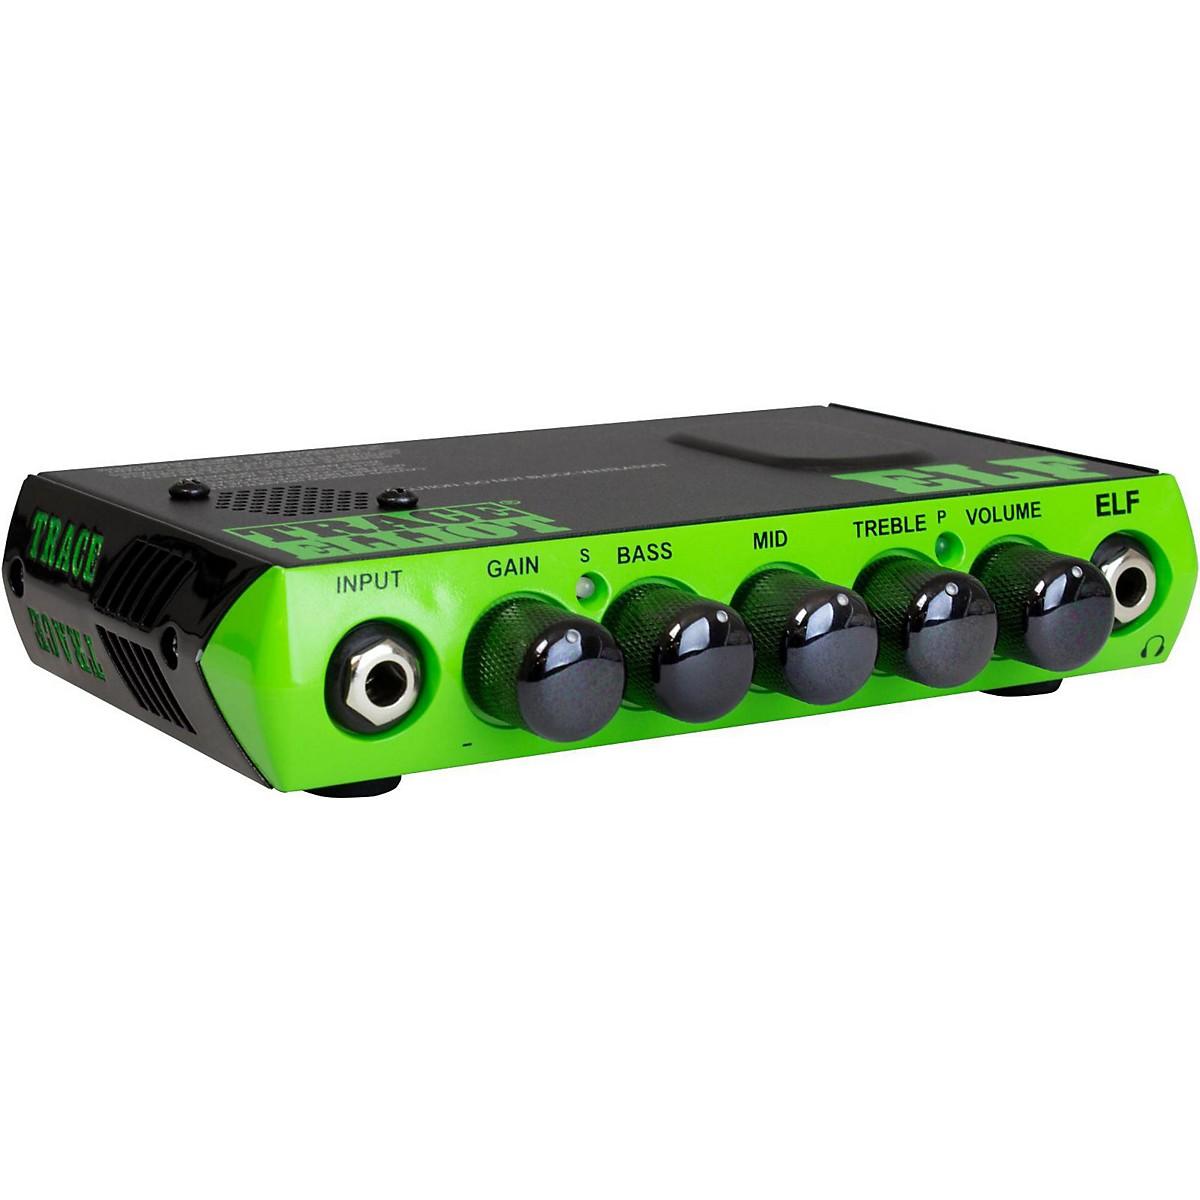 Trace Elliot ELF 200W Micro Bass Guitar Amp Head